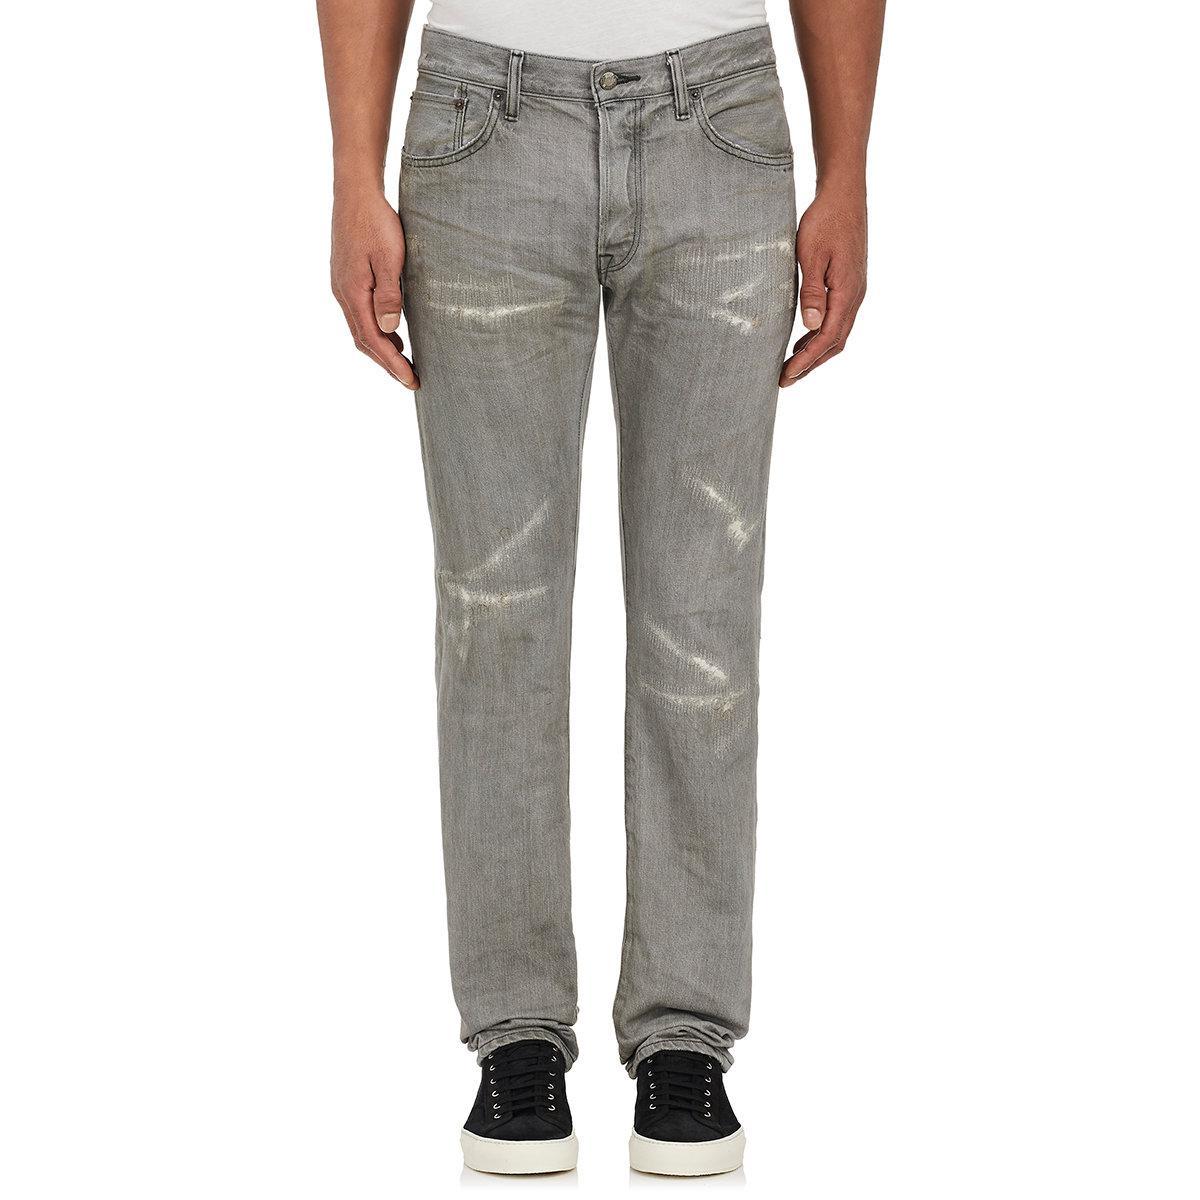 Mens Ritsu Slim Jeans Fabric Brand & Co. s0i8IfxU